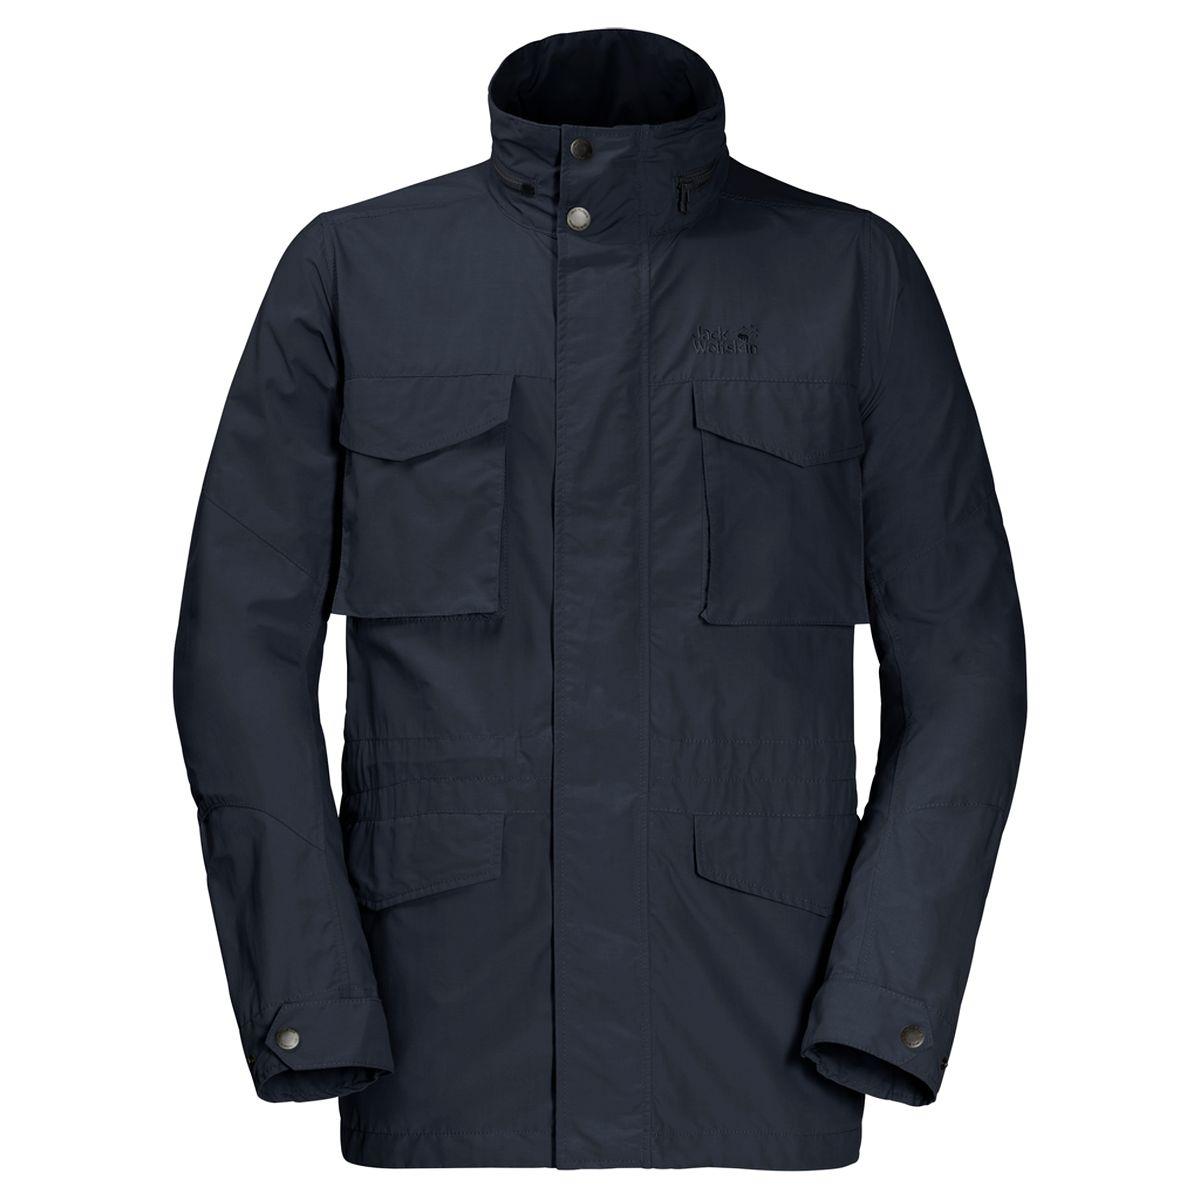 Куртка Jack Wolfskin Freemont Fieldjacket куртка мужская jack wolfskin yukon parka цвет серо зеленый 1109772 5515 размер xl 52